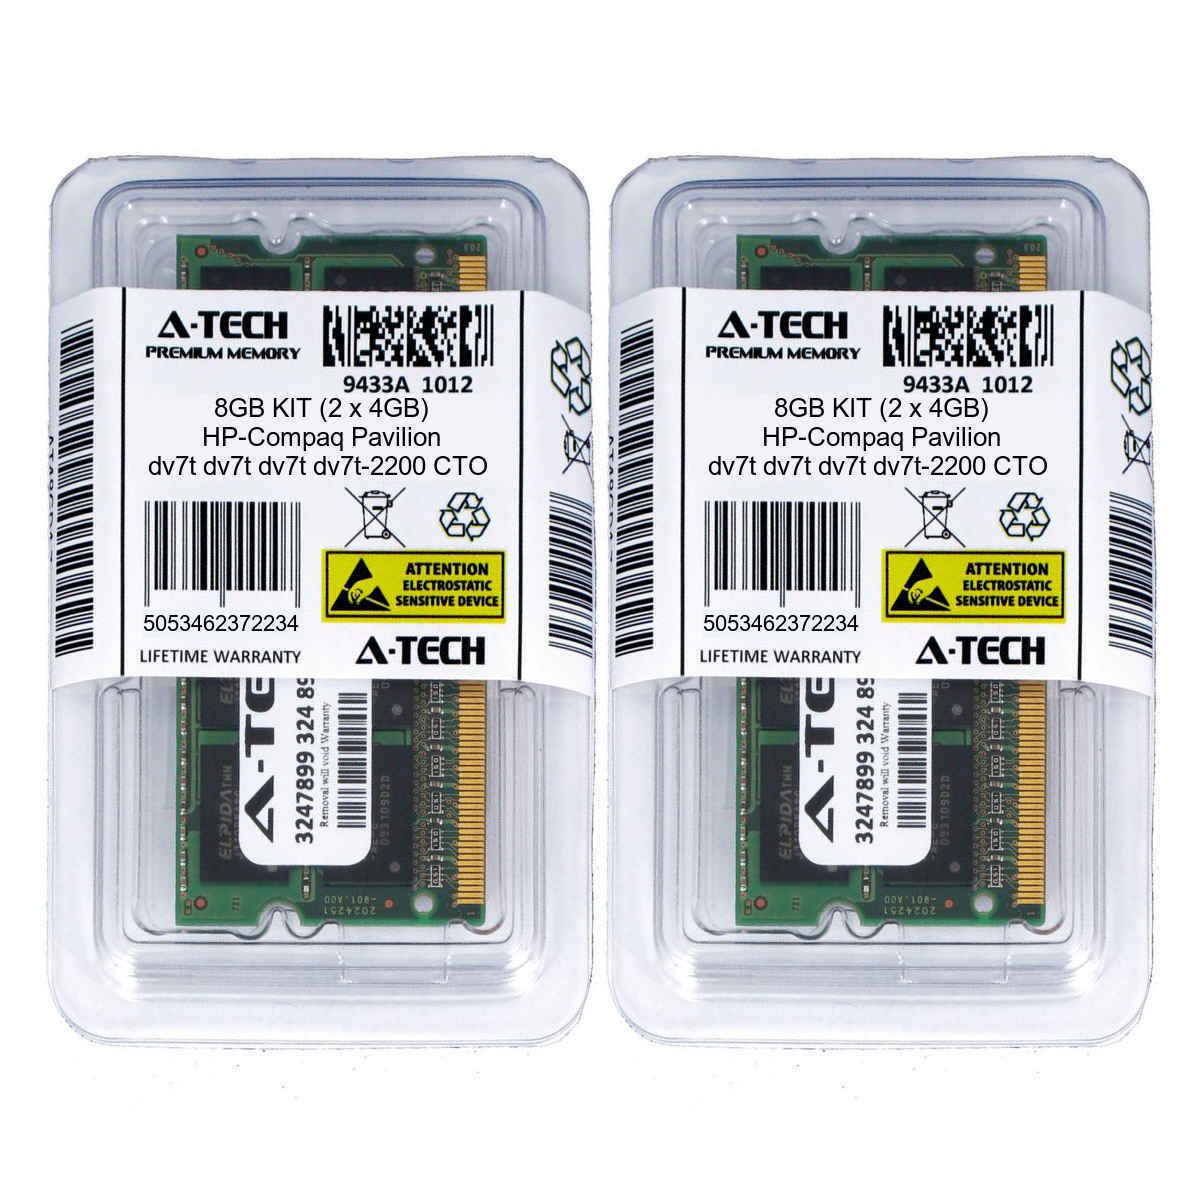 Team High Performance Memory RAM Upgrade For HP Compaq Pavilion dv3-2302tu dv3-2302tx dv3-2303tu dv3-2304tx Laptop 4GBx2 8GB The Memory Kit comes with Life Time Warranty.